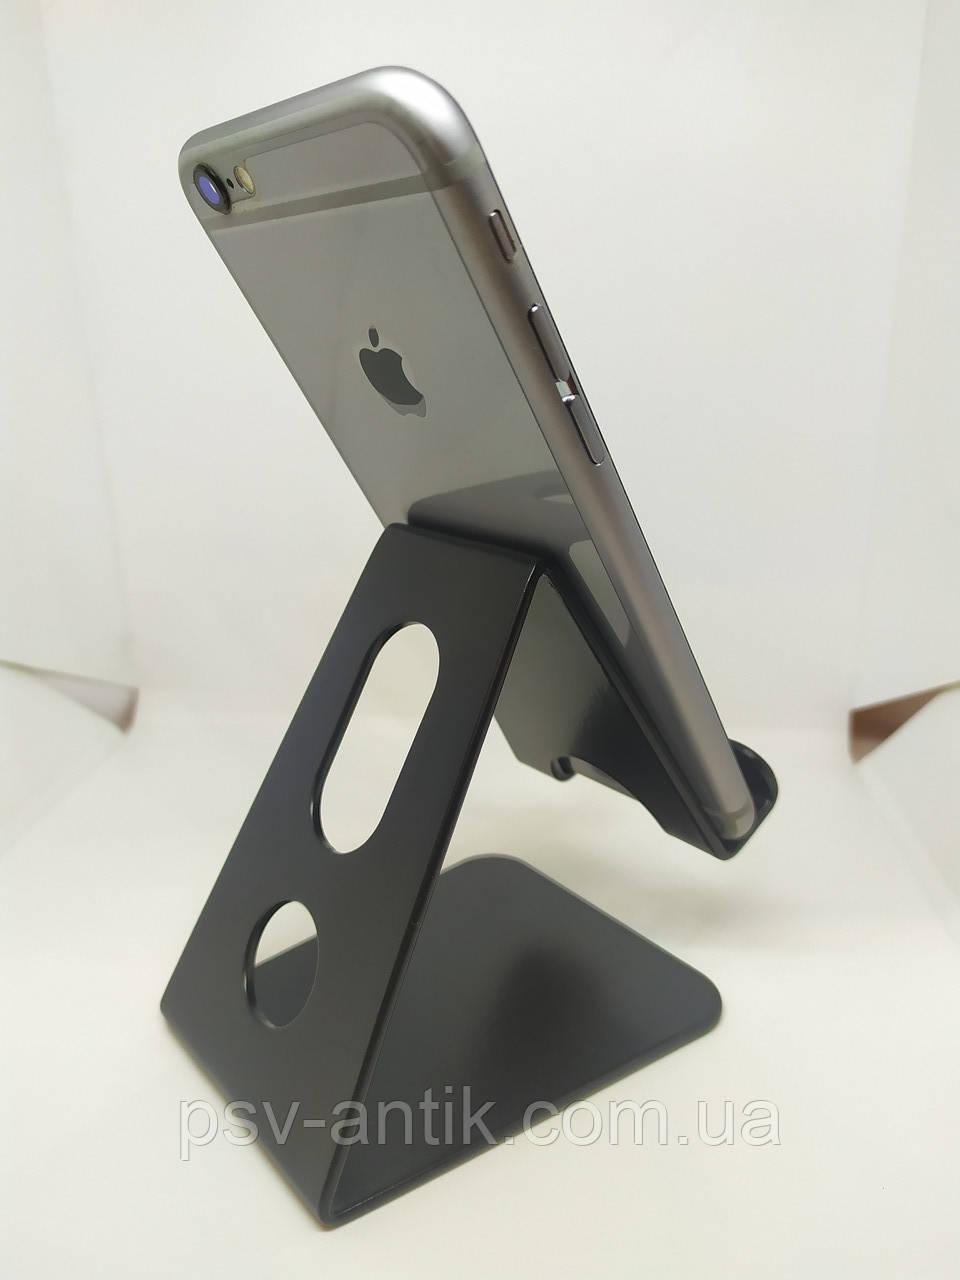 Подставка под телефон.  Для Apple iPhone, Samsung , Хiaomi, Huawei, Lenovo, HTC, ASUS, LG.